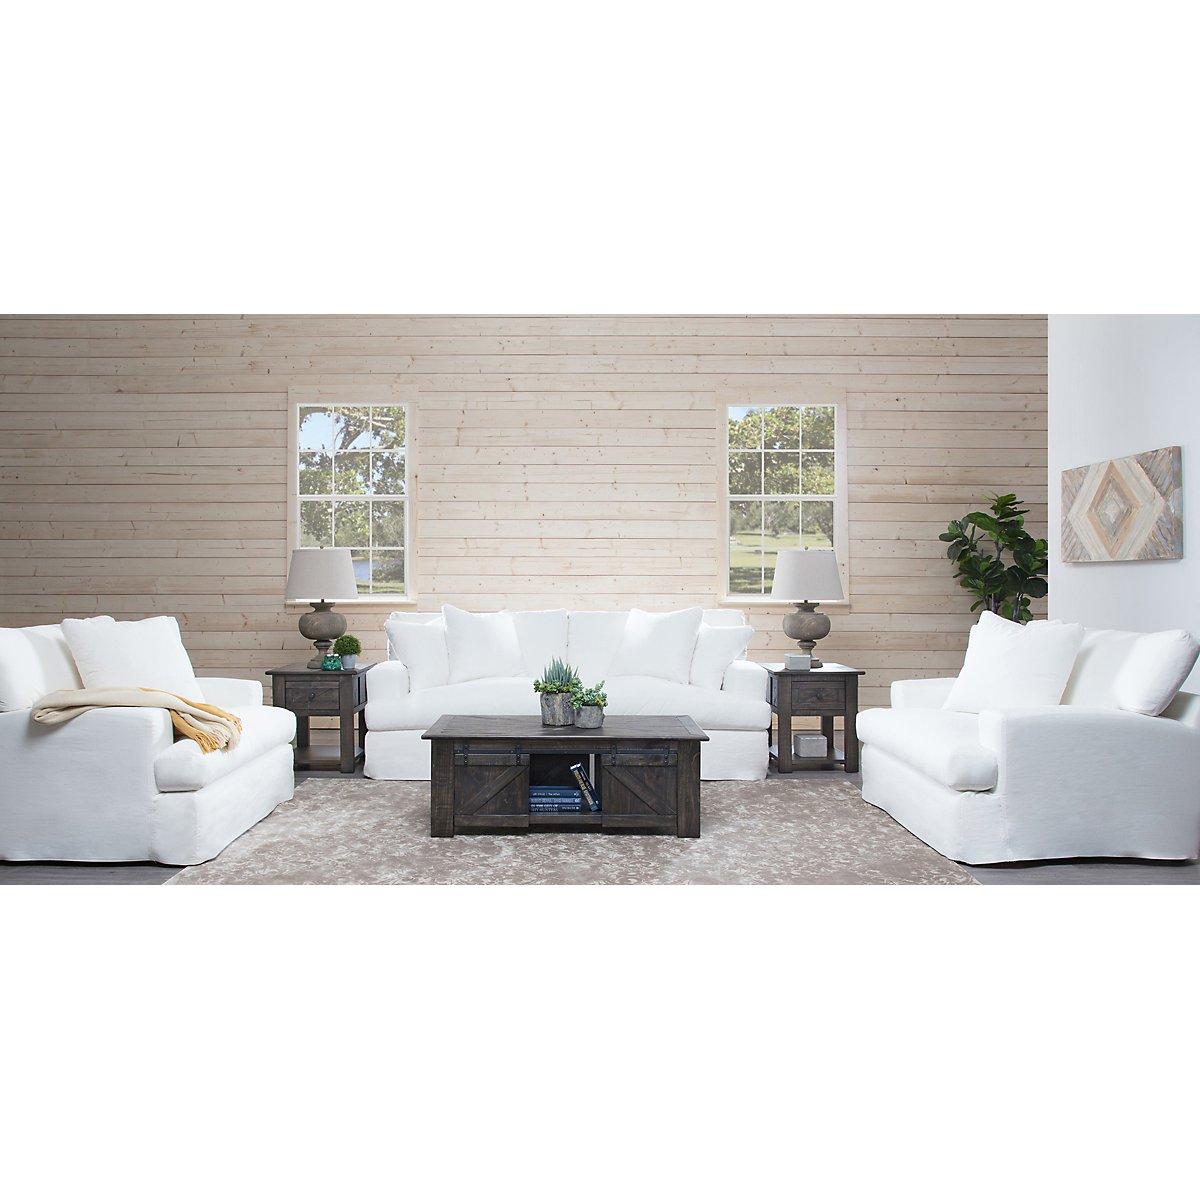 City Furniture Delilah White Fabric Sofa